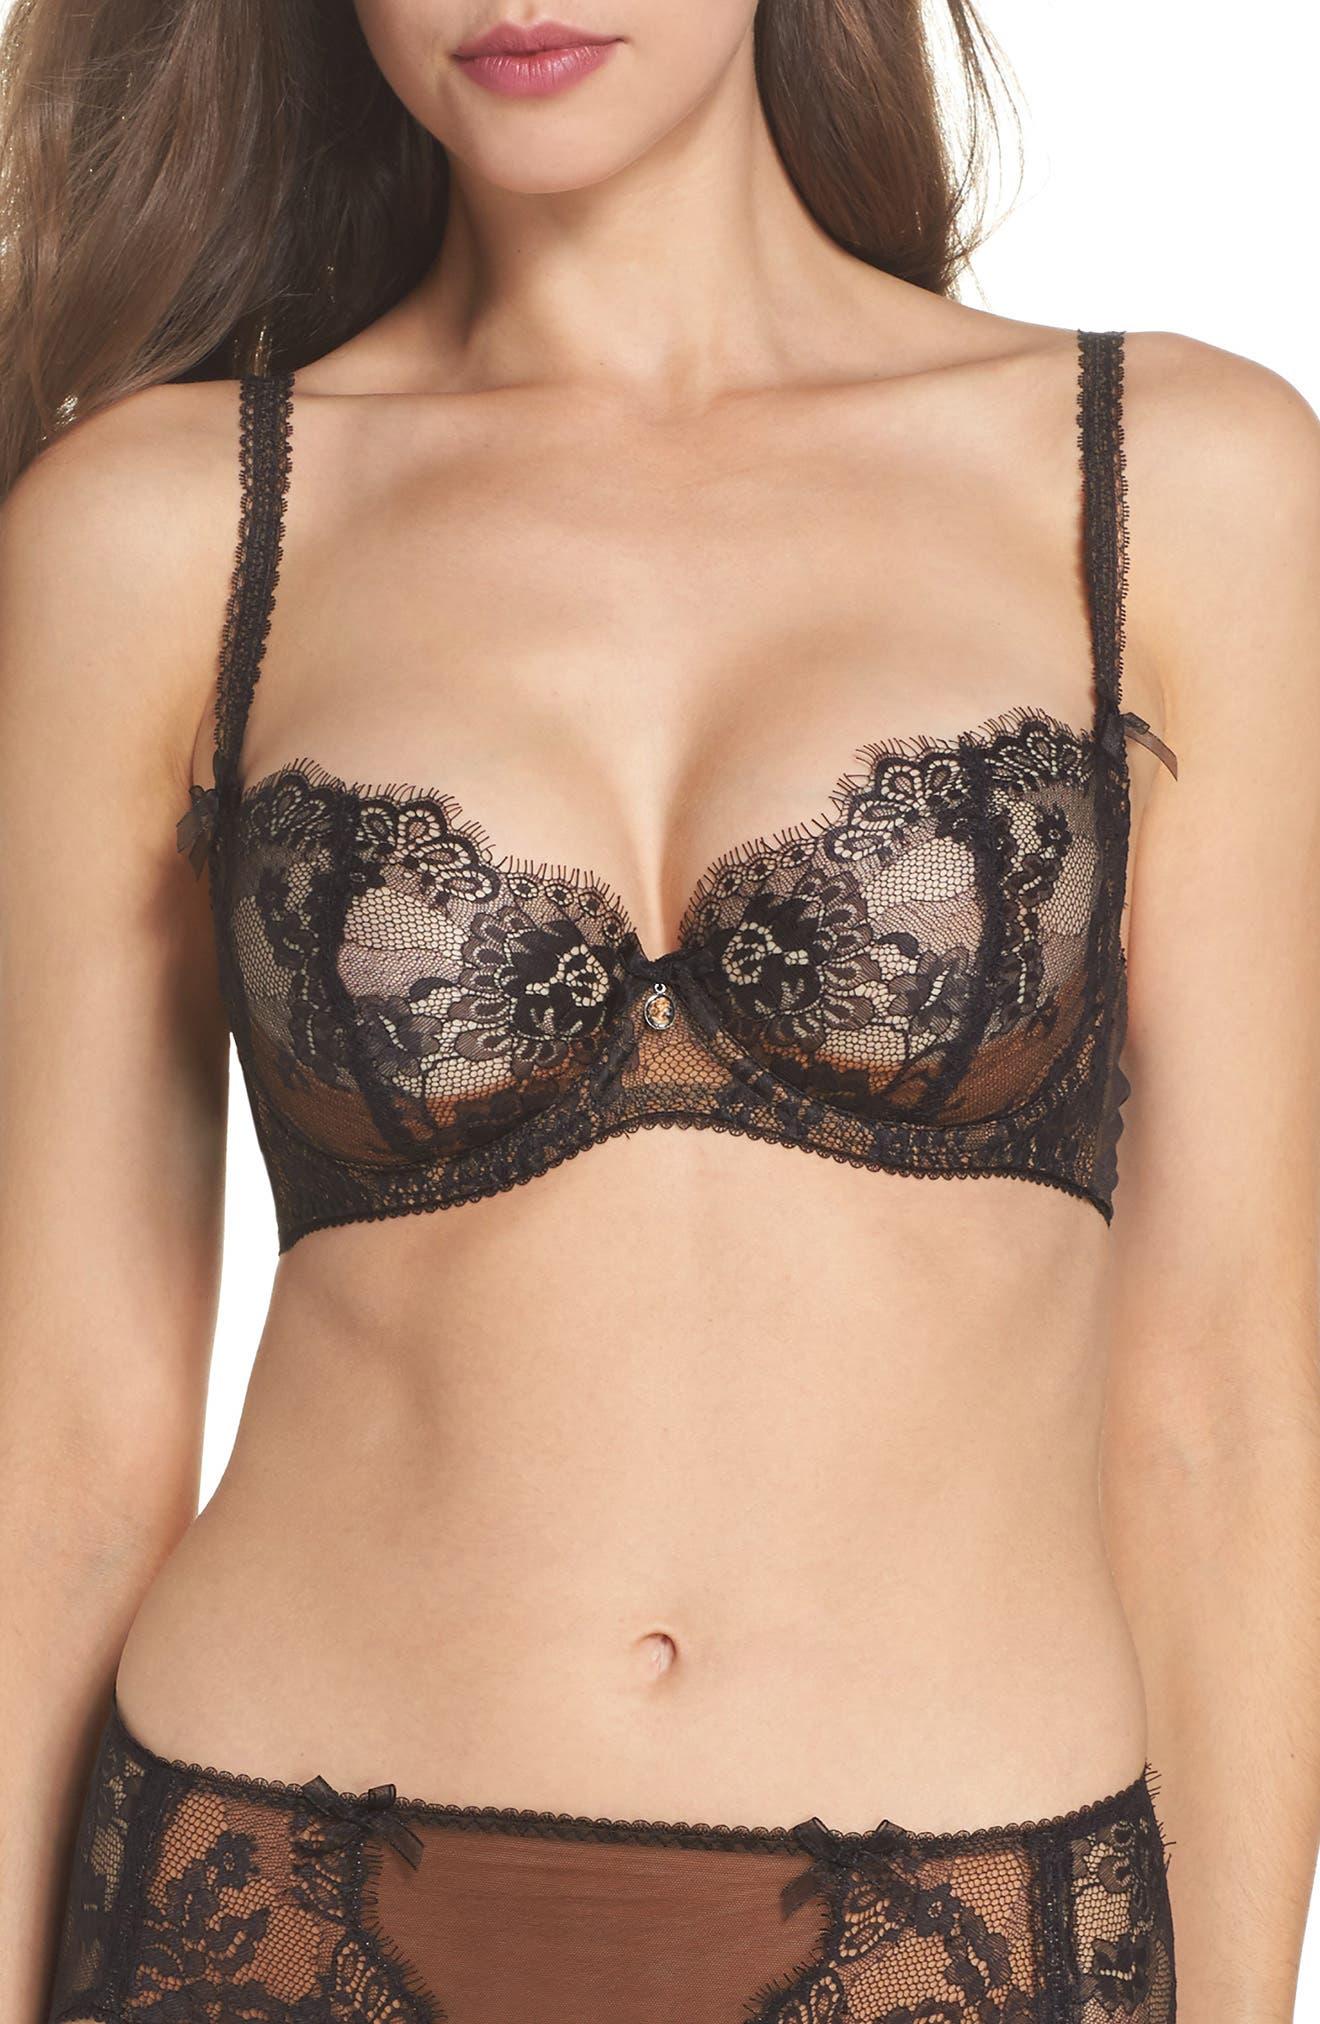 Savoir Faire Sheer Lace Balconette Underwire Bra in Black/ Copper